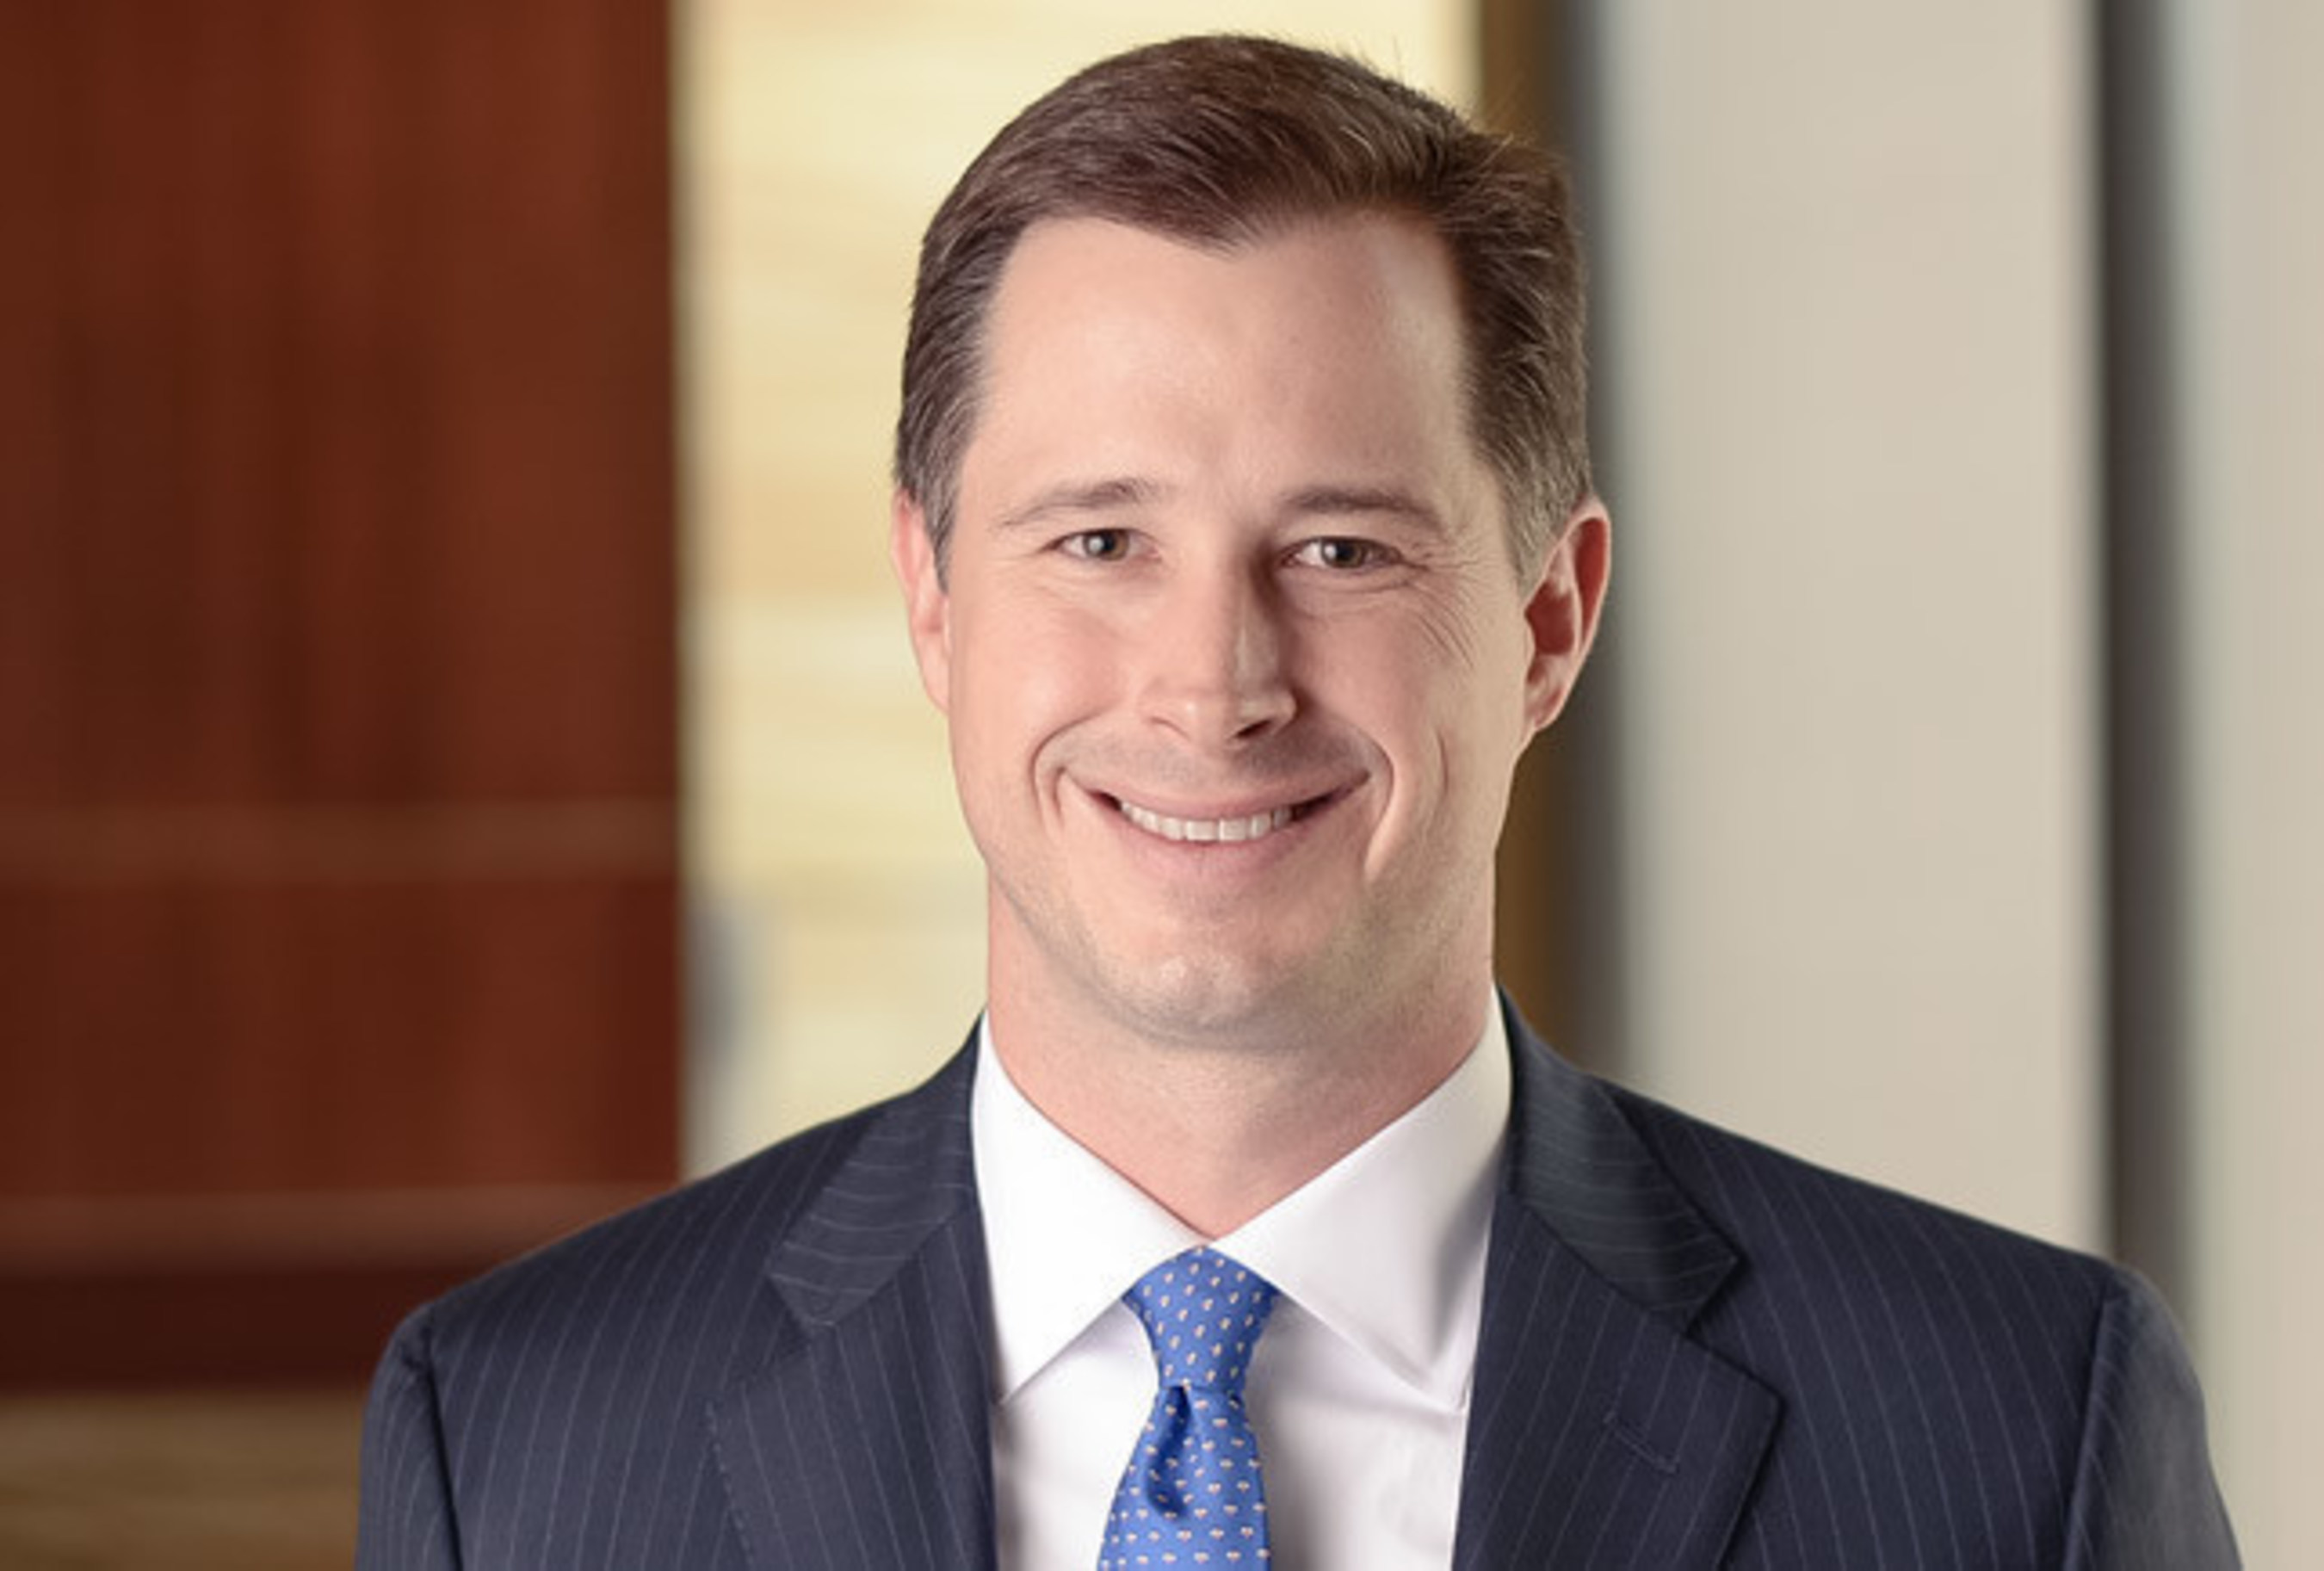 Jeff Sanders, Vice Chairman - Co-Managing Partner, Global CEO & Board Practice - Heidrick & Struggles